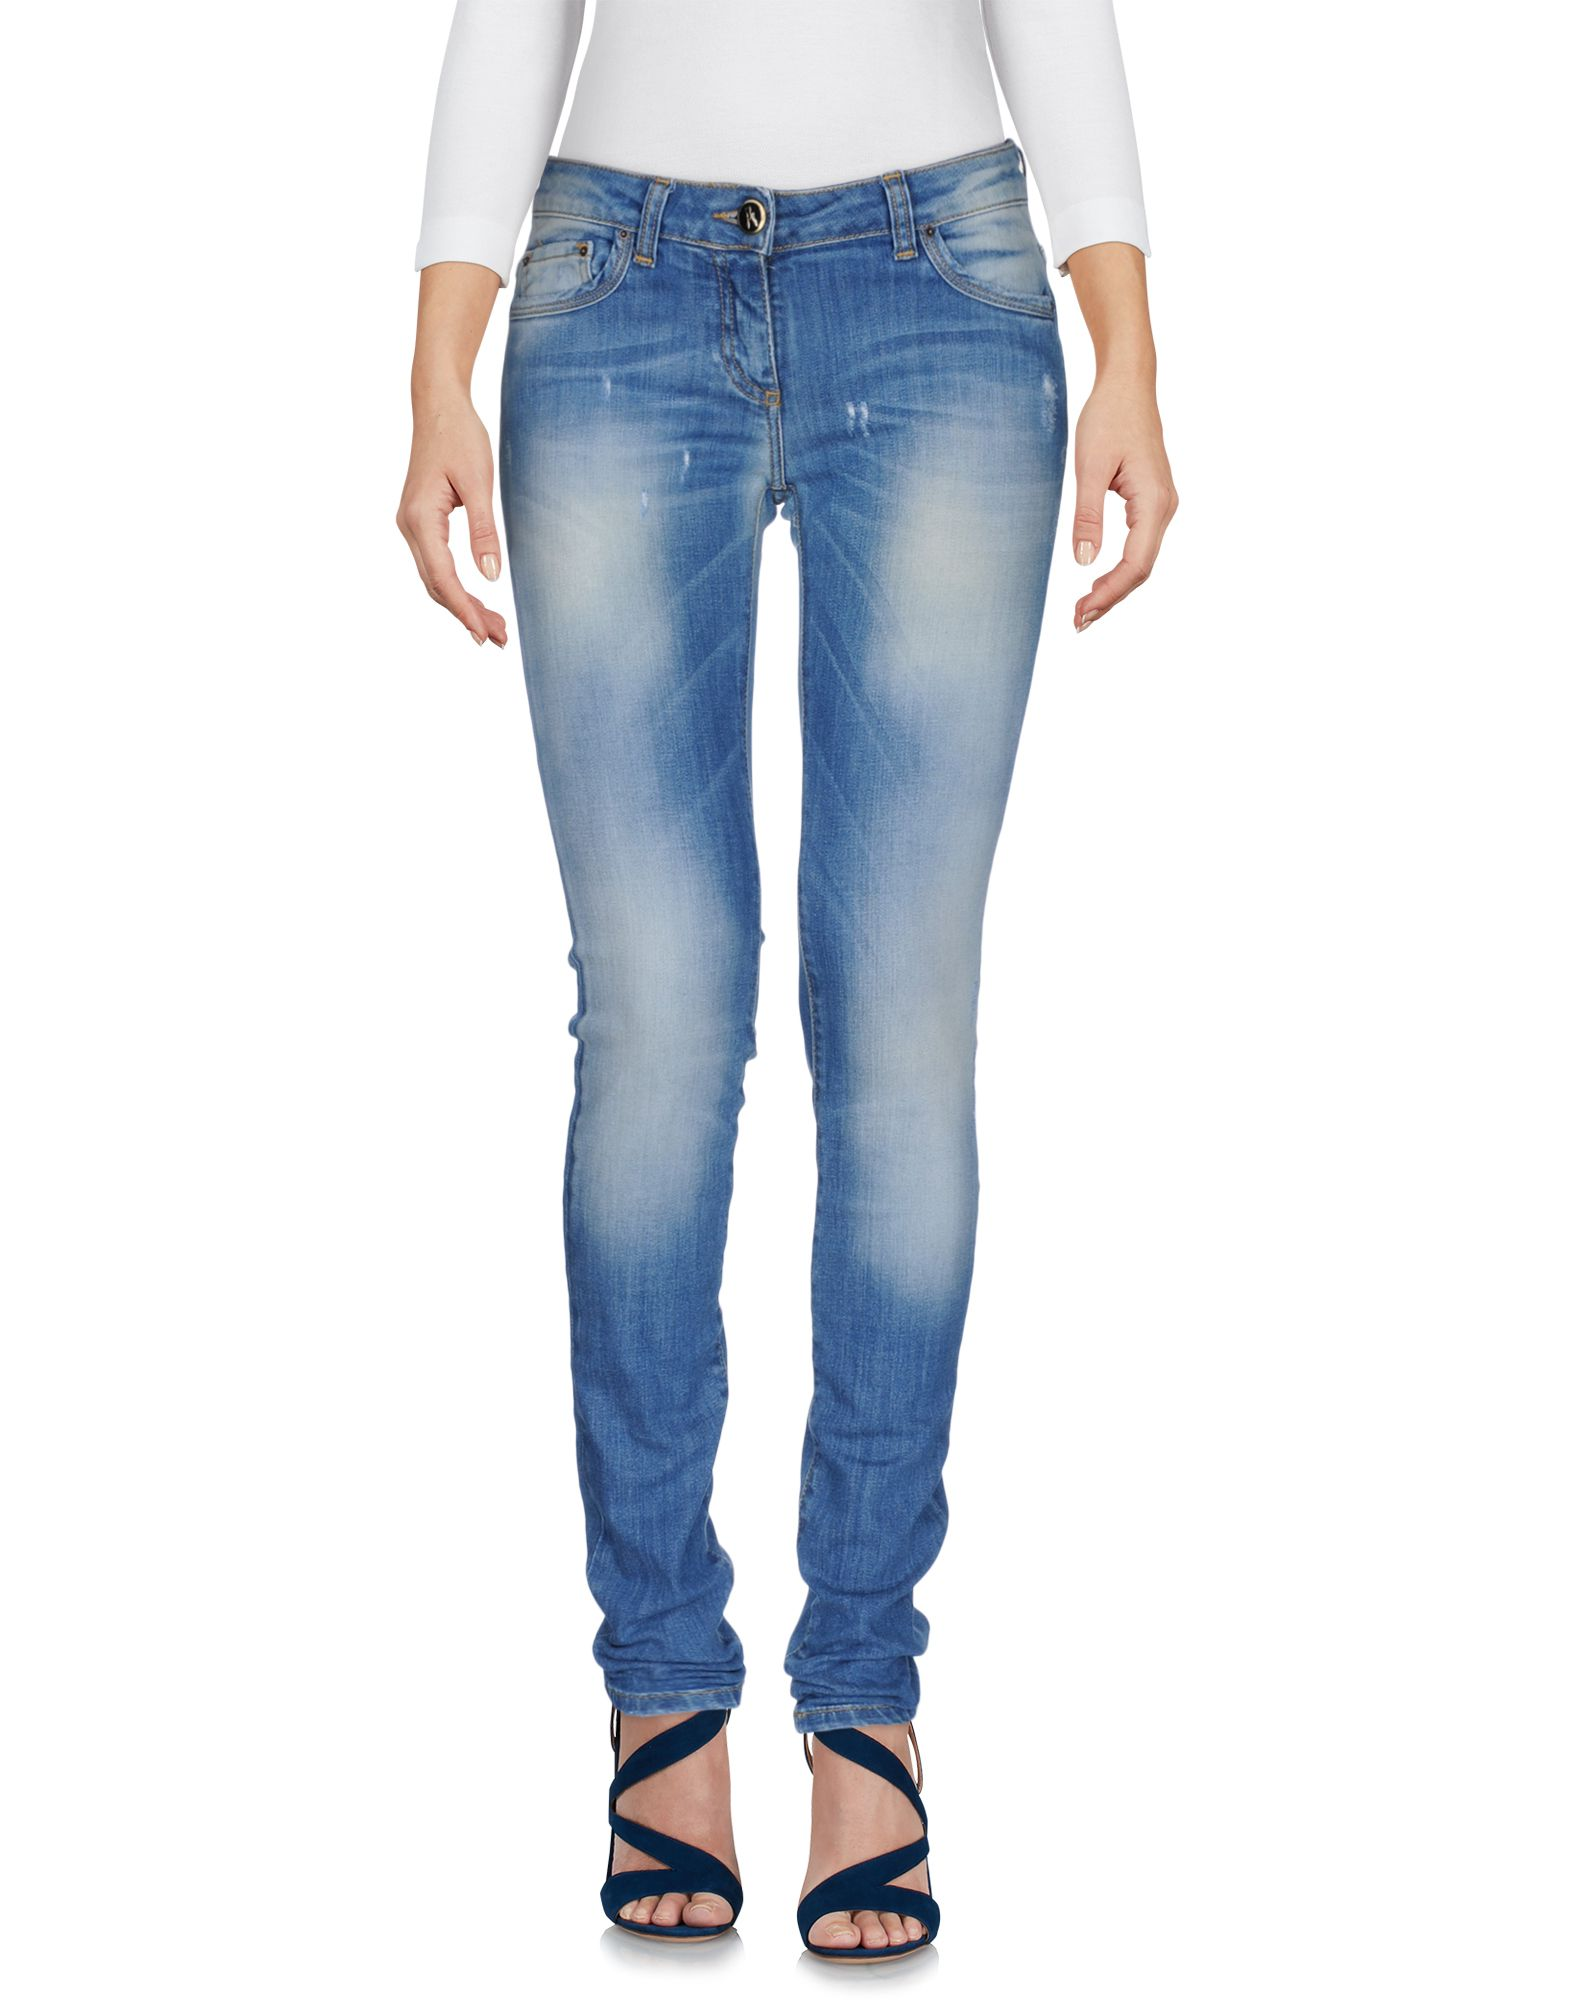 ANIYE BY Damen Jeanshose Farbe Blau Größe 8